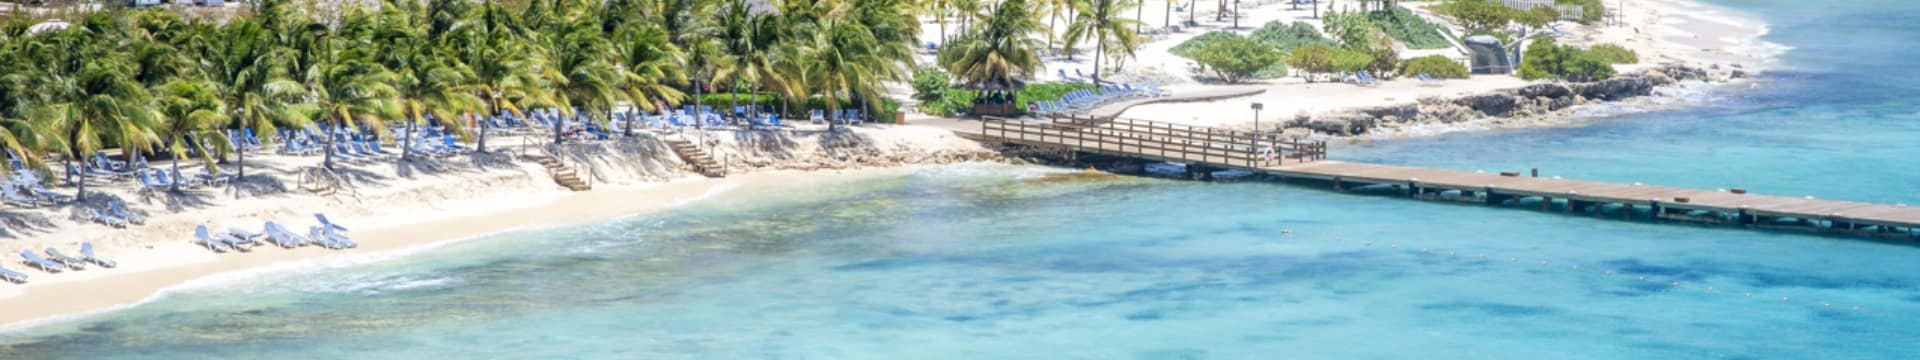 Vista aéra ilha Grand Turk